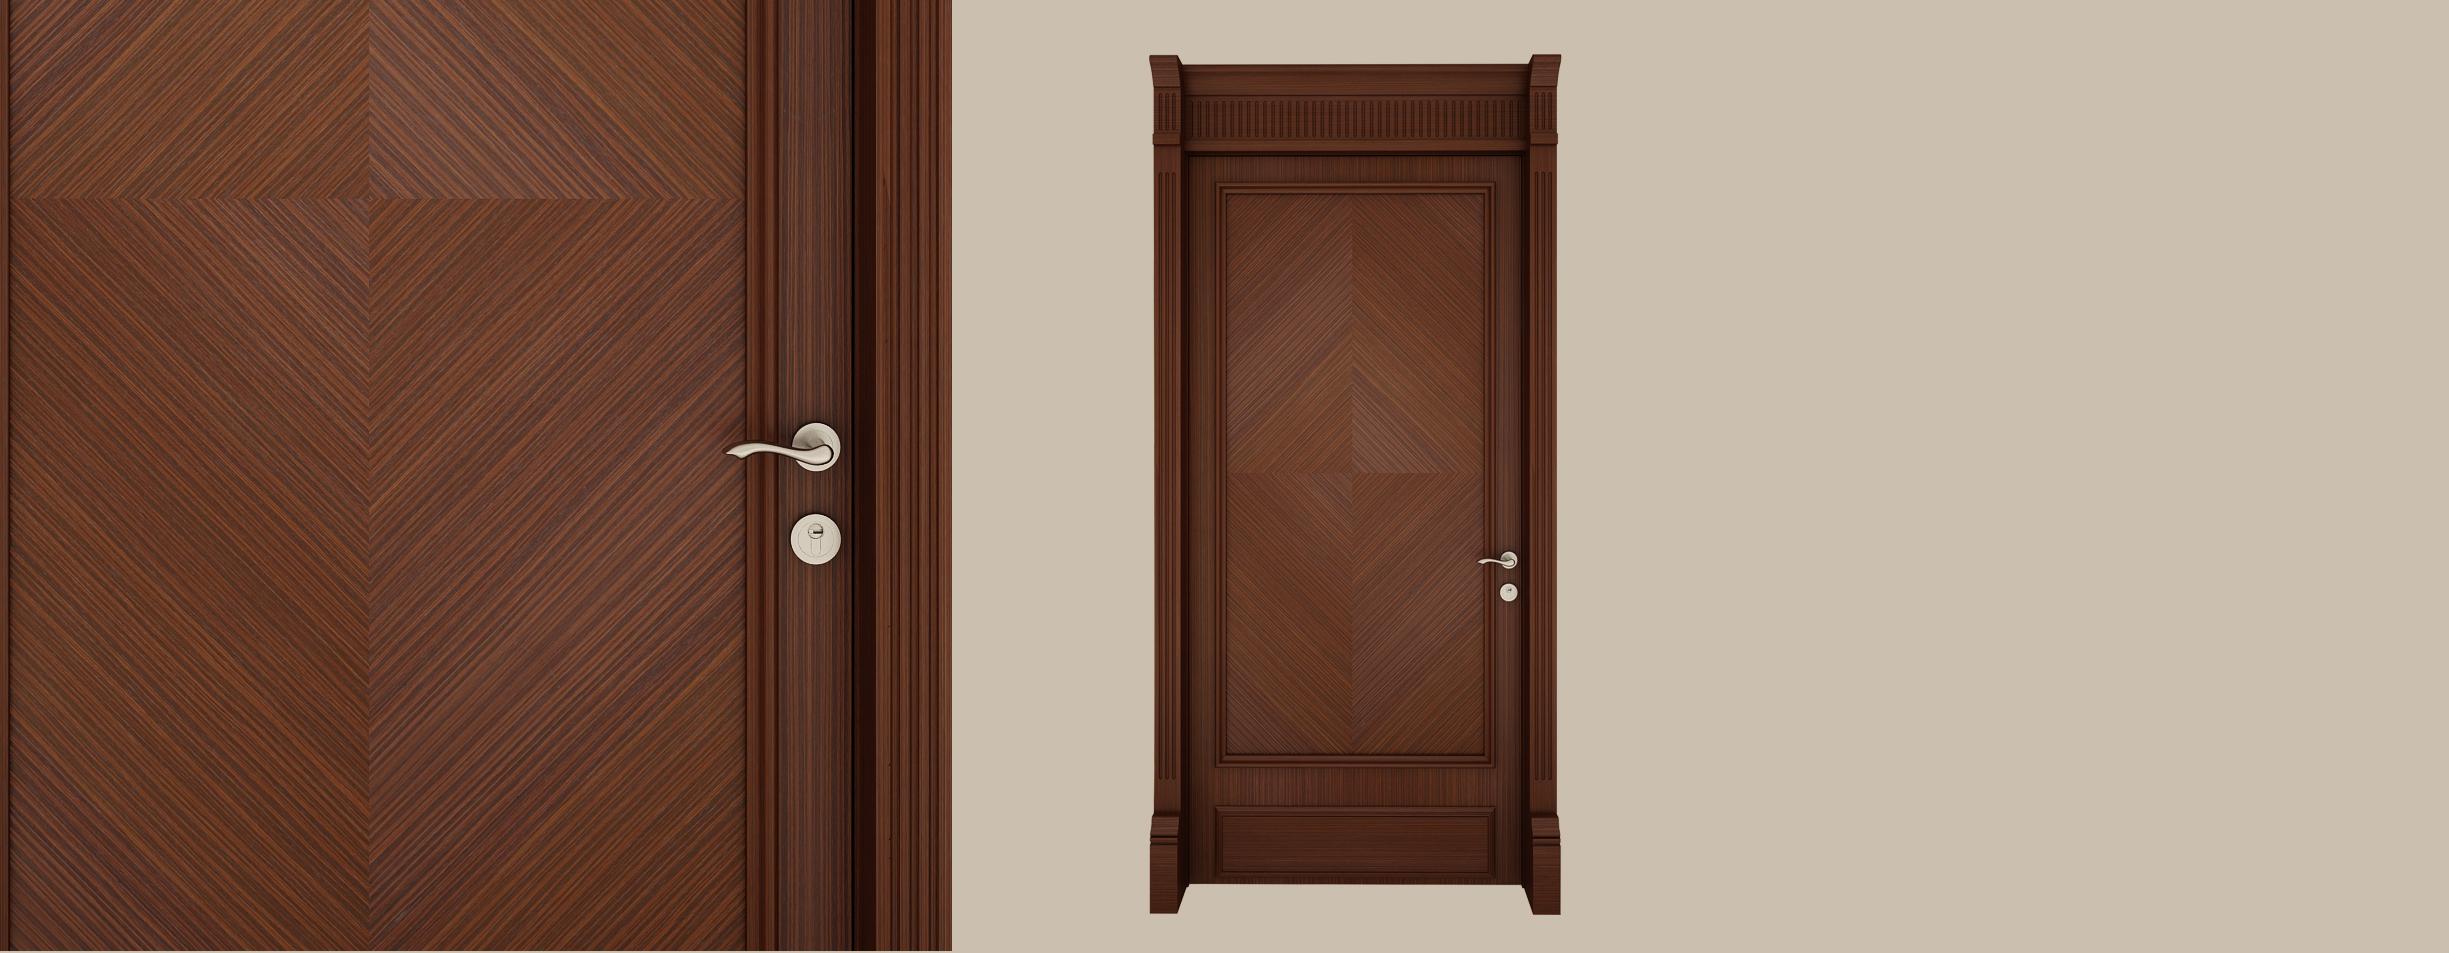 KOSA DOORS